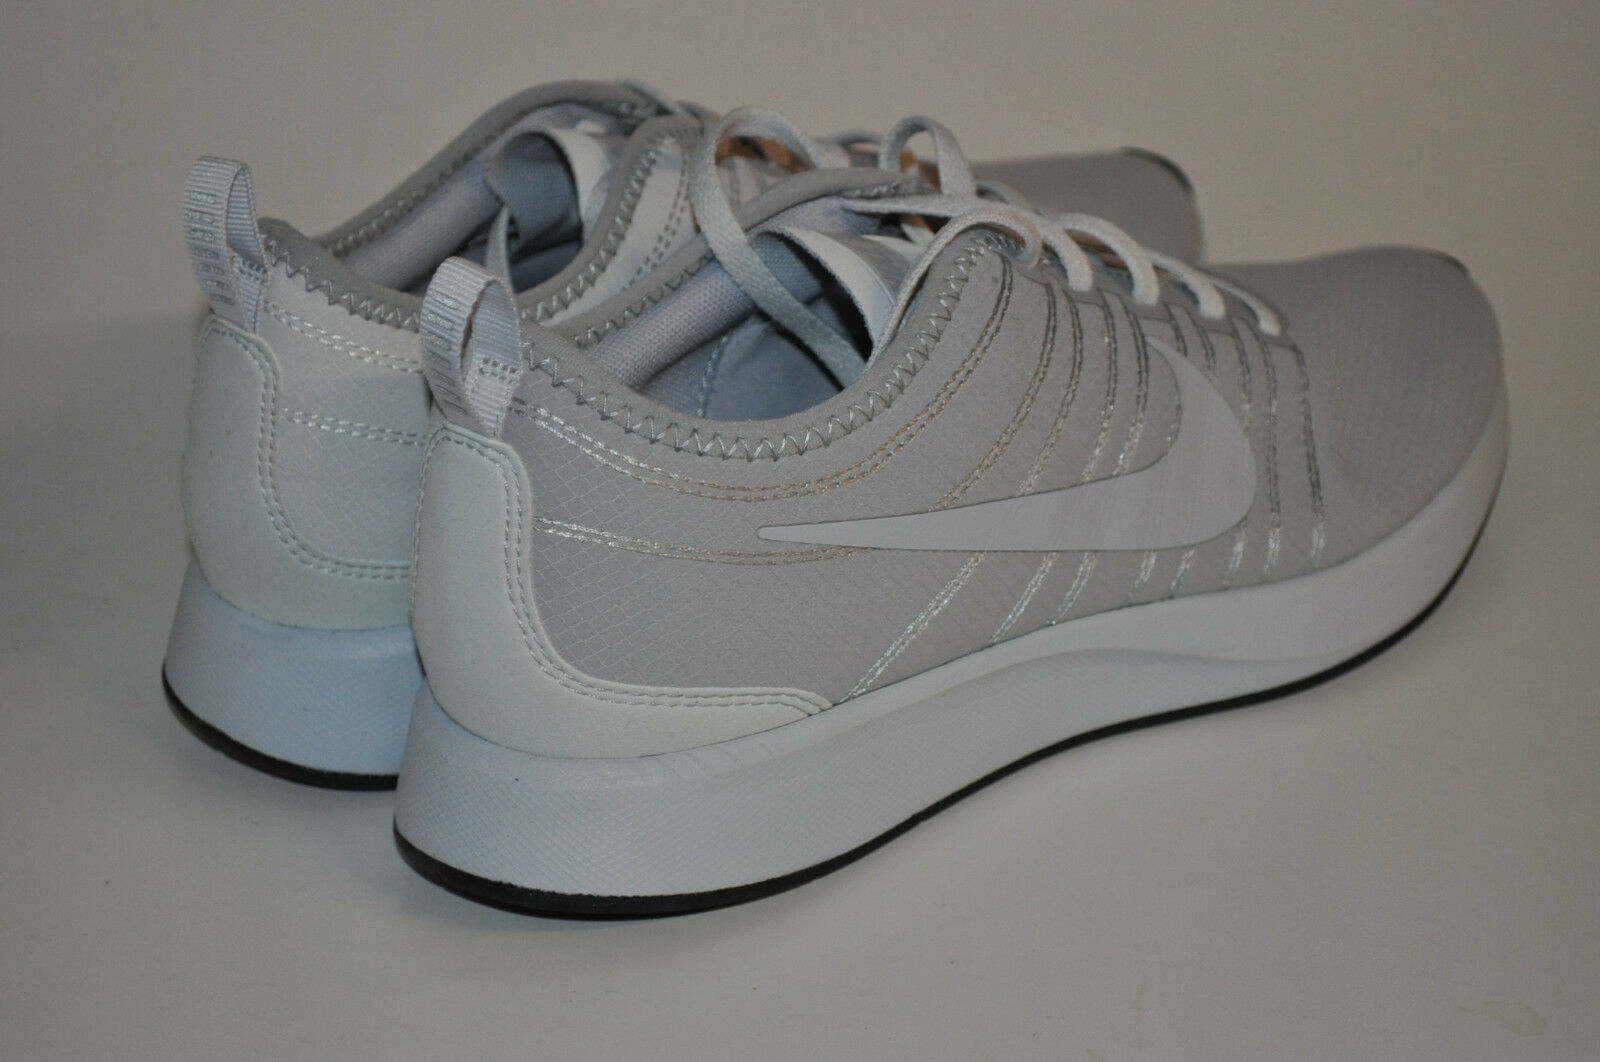 Nike Dualtone Racer Racer Racer SE 922170-003 Wolf Grau Pure Platinum Grau Platin 76aa4b